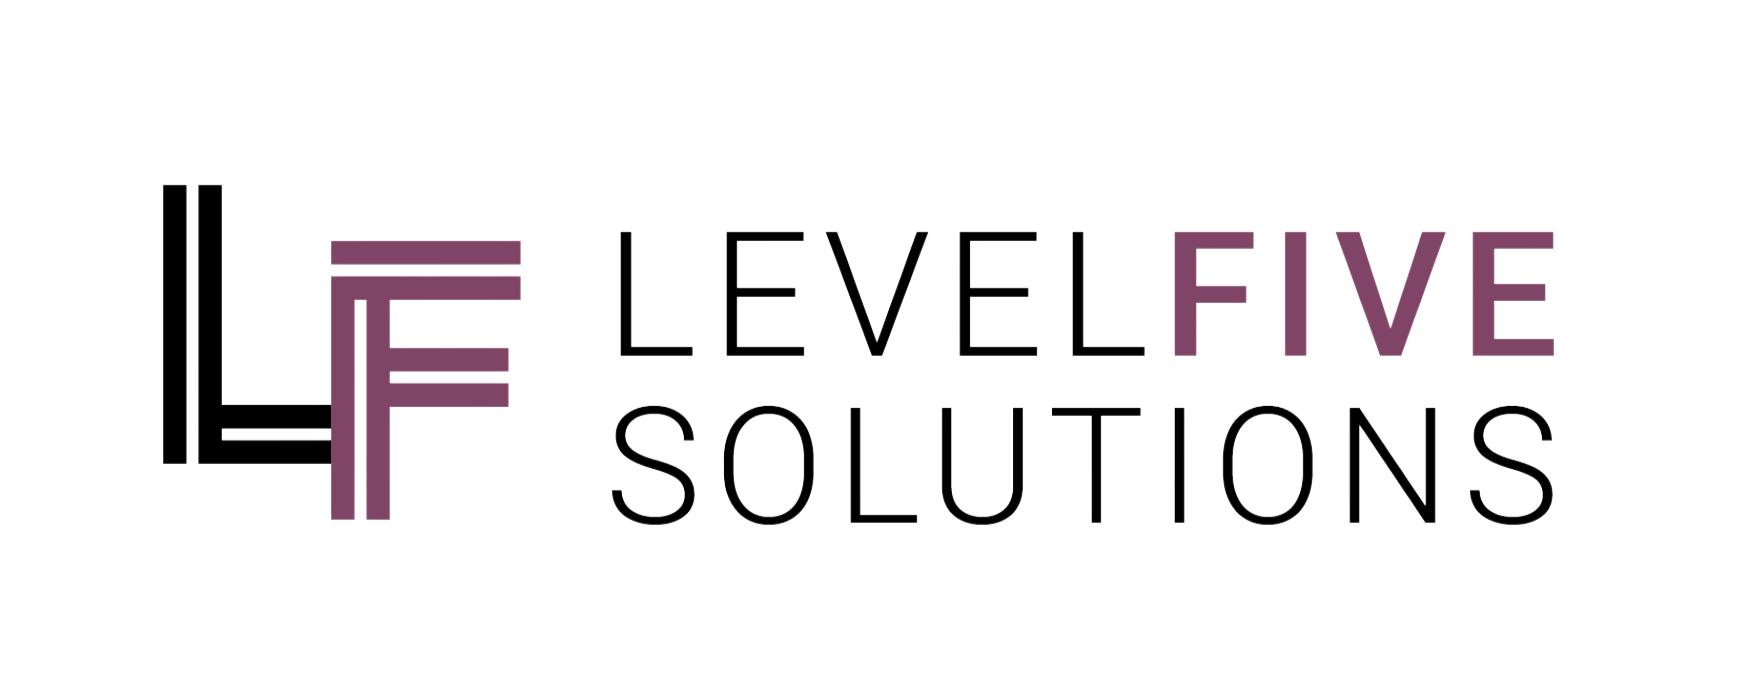 LevelFive Solutions